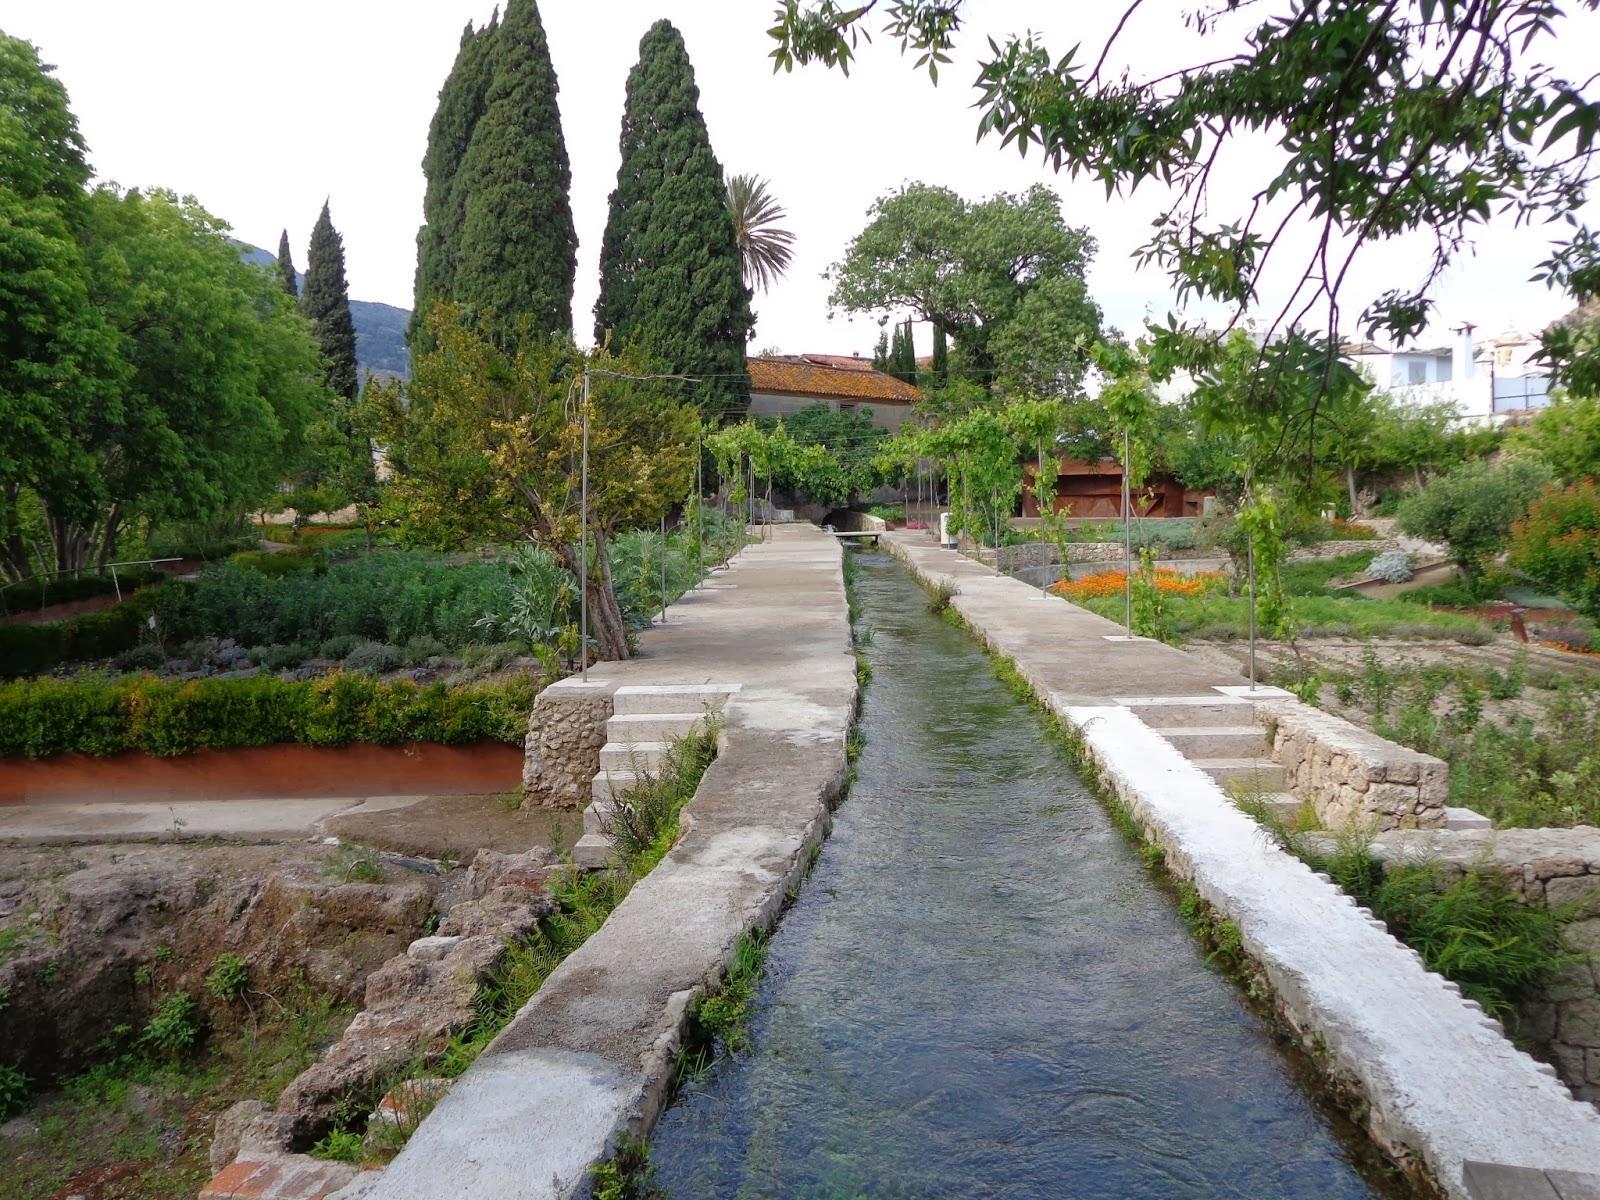 wadi l faw patrimonio hist rico cultural y natural del